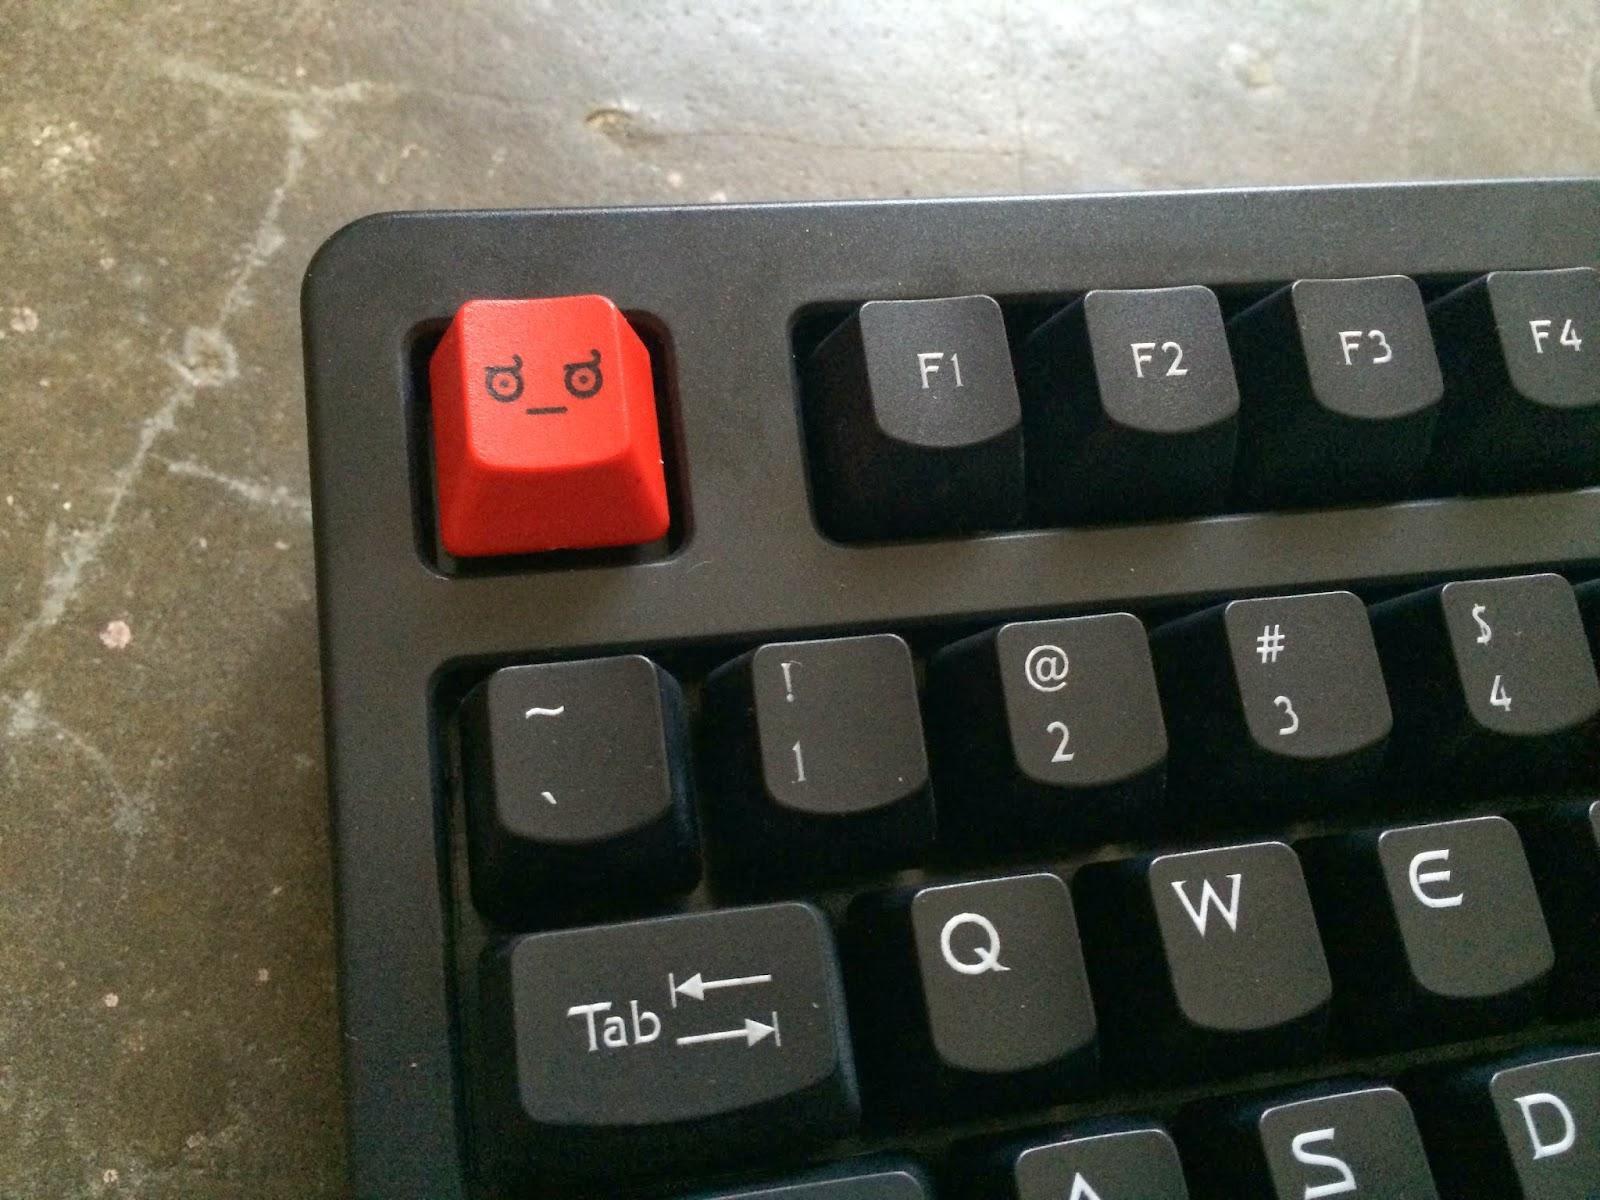 Unboxing & Review: i-Rocks K10 Gaming Keyboard 63